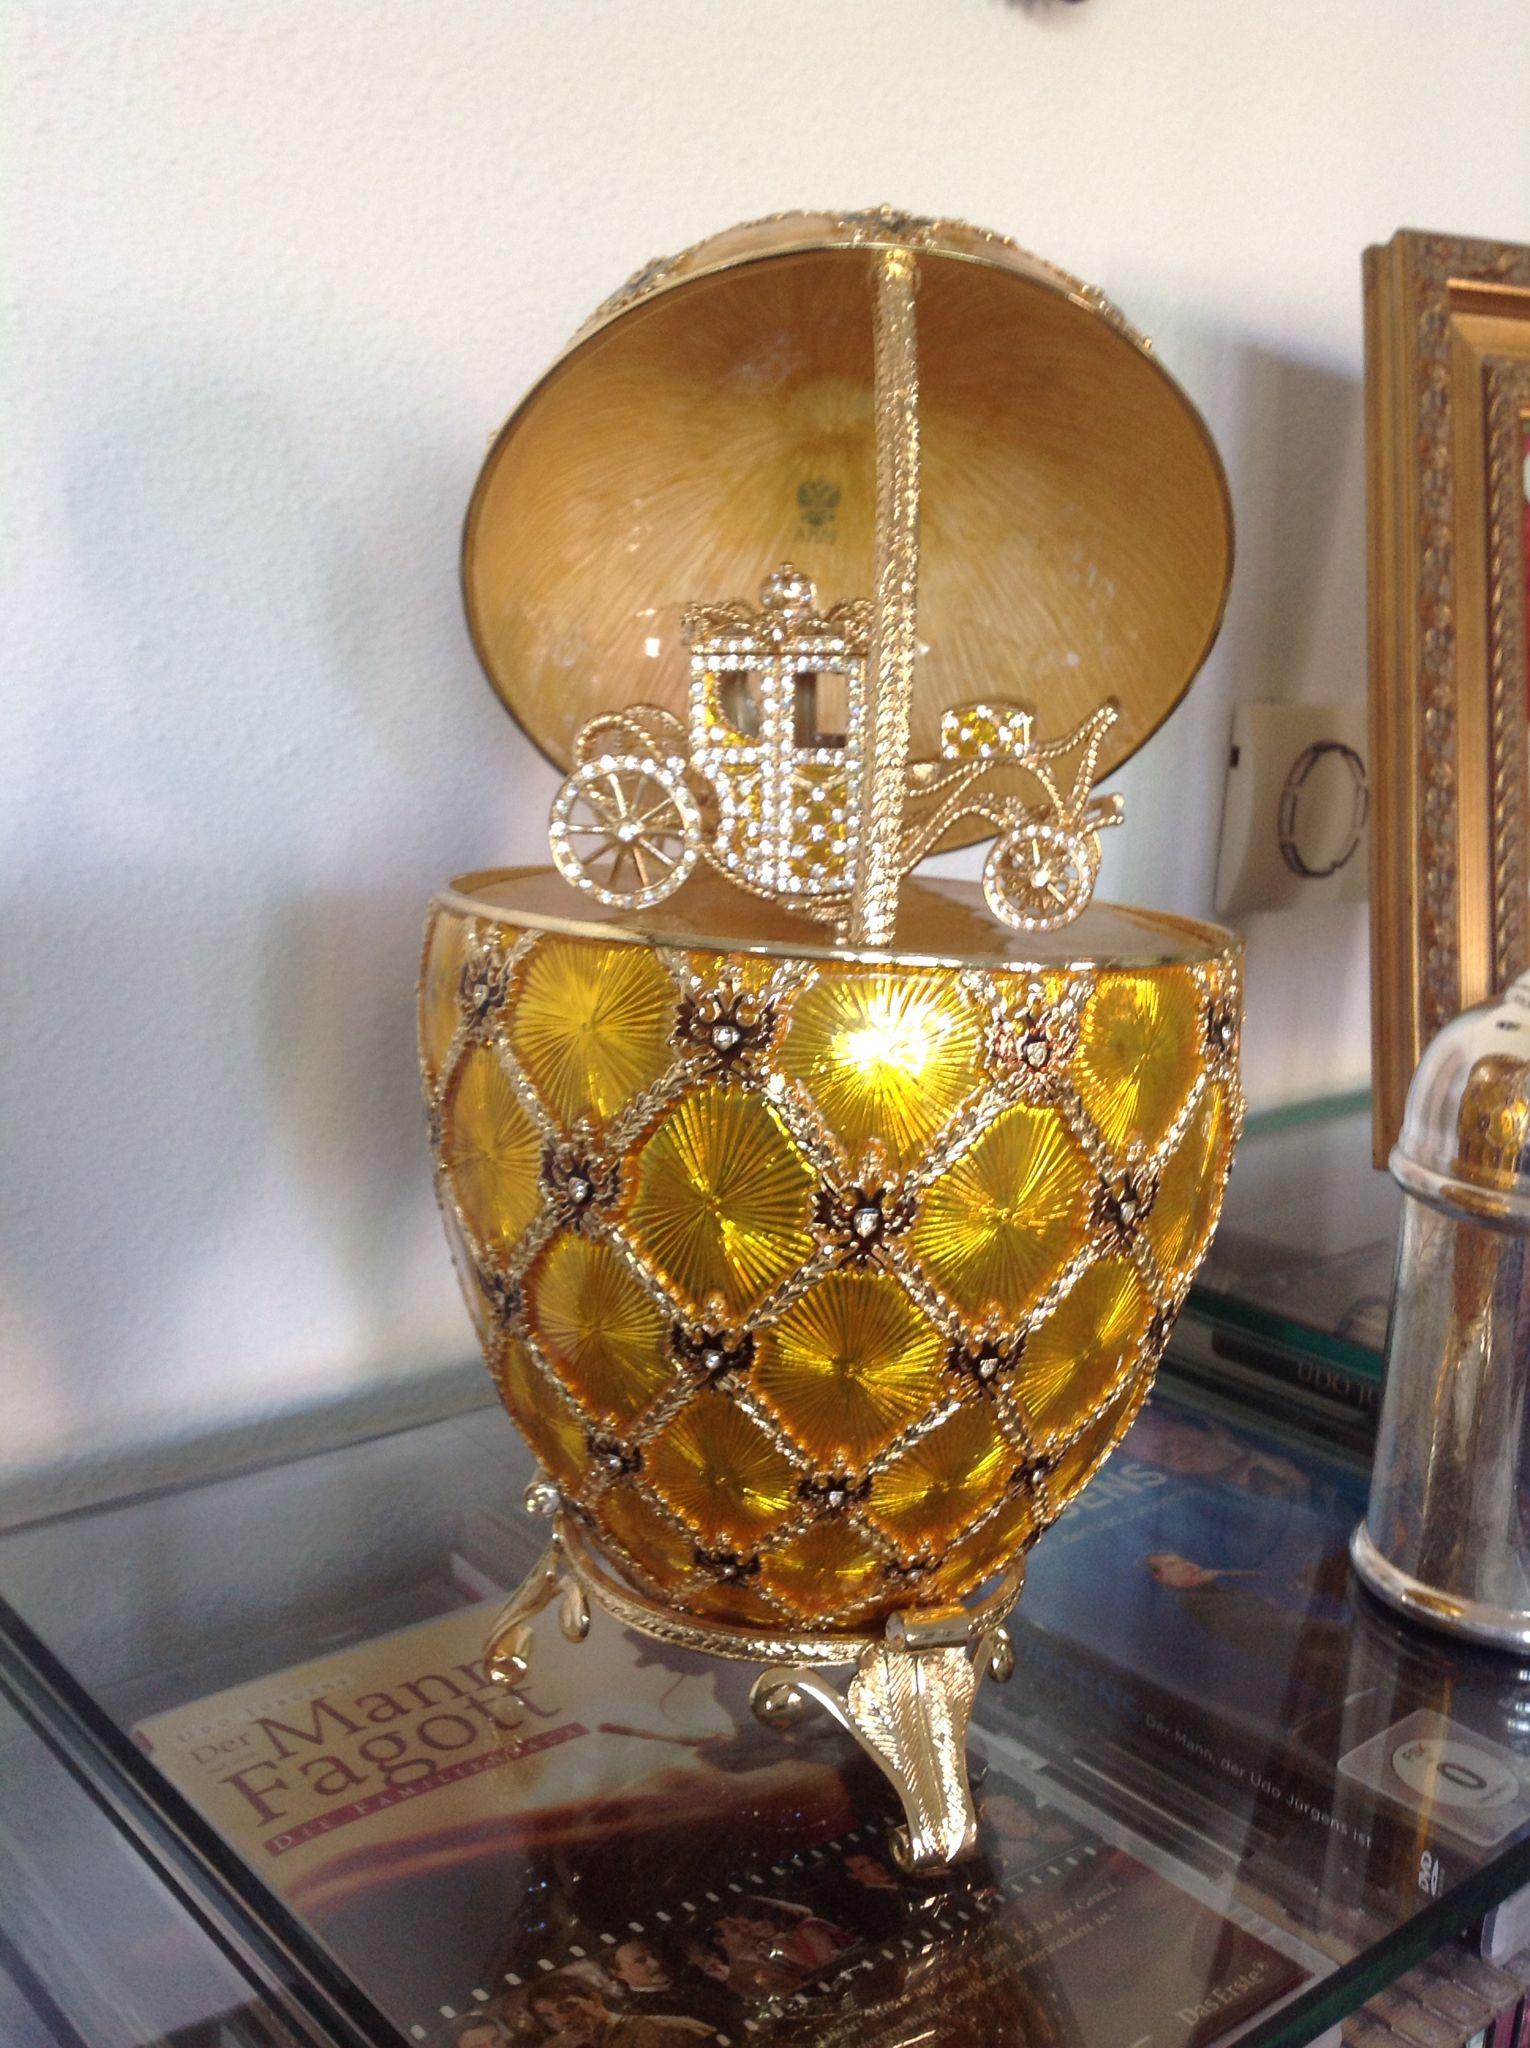 Faberge replica Coronation Egg